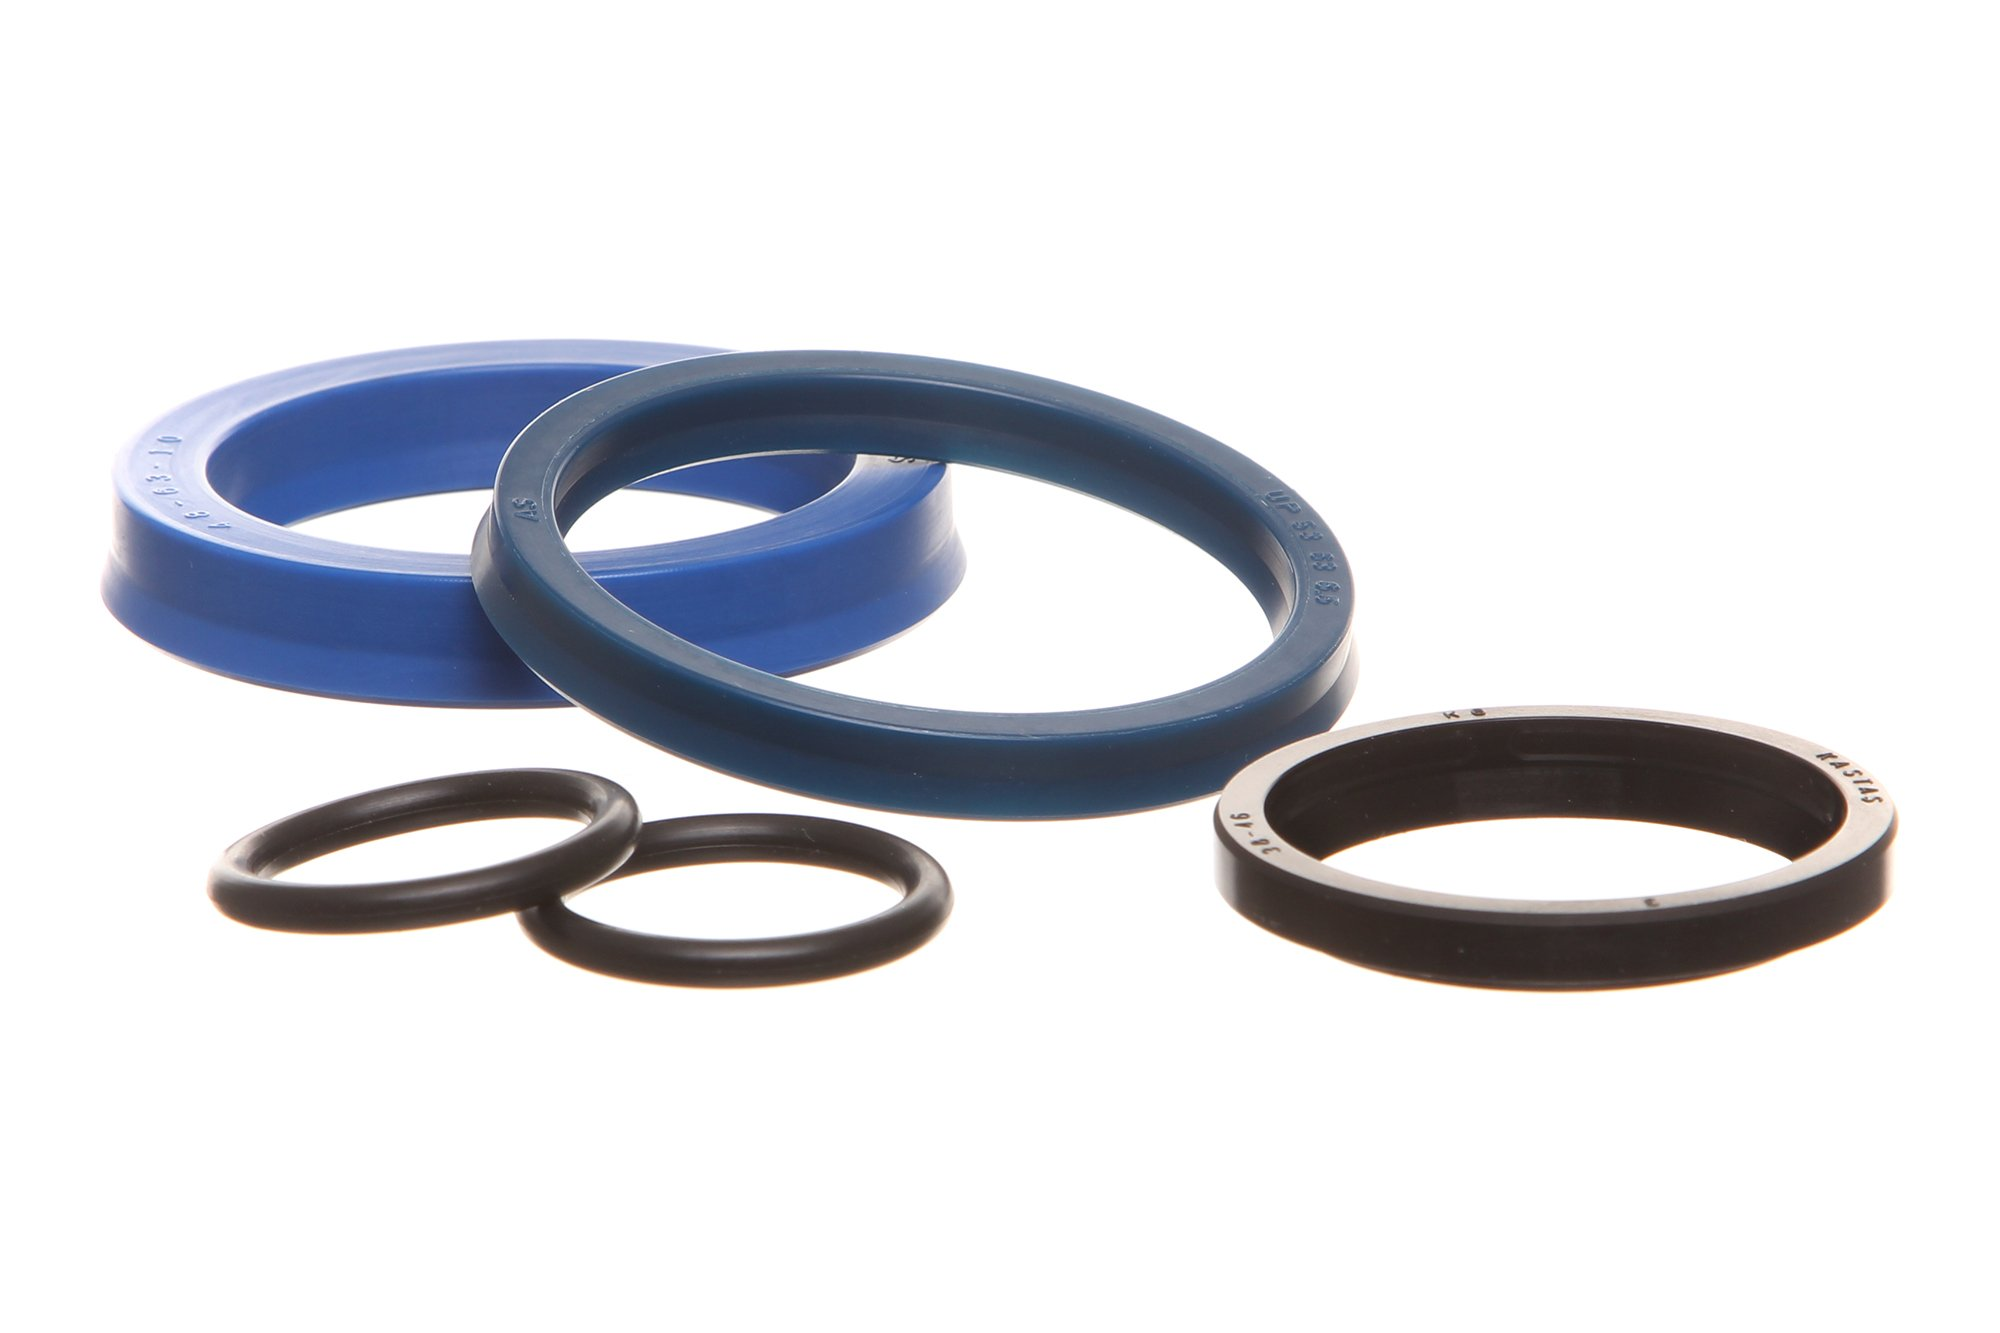 Duro Cylinder Seal Kit Tuxedo Lifts Equivalent to TP9-1057 for TP9, TP9KAC, TP9KAF